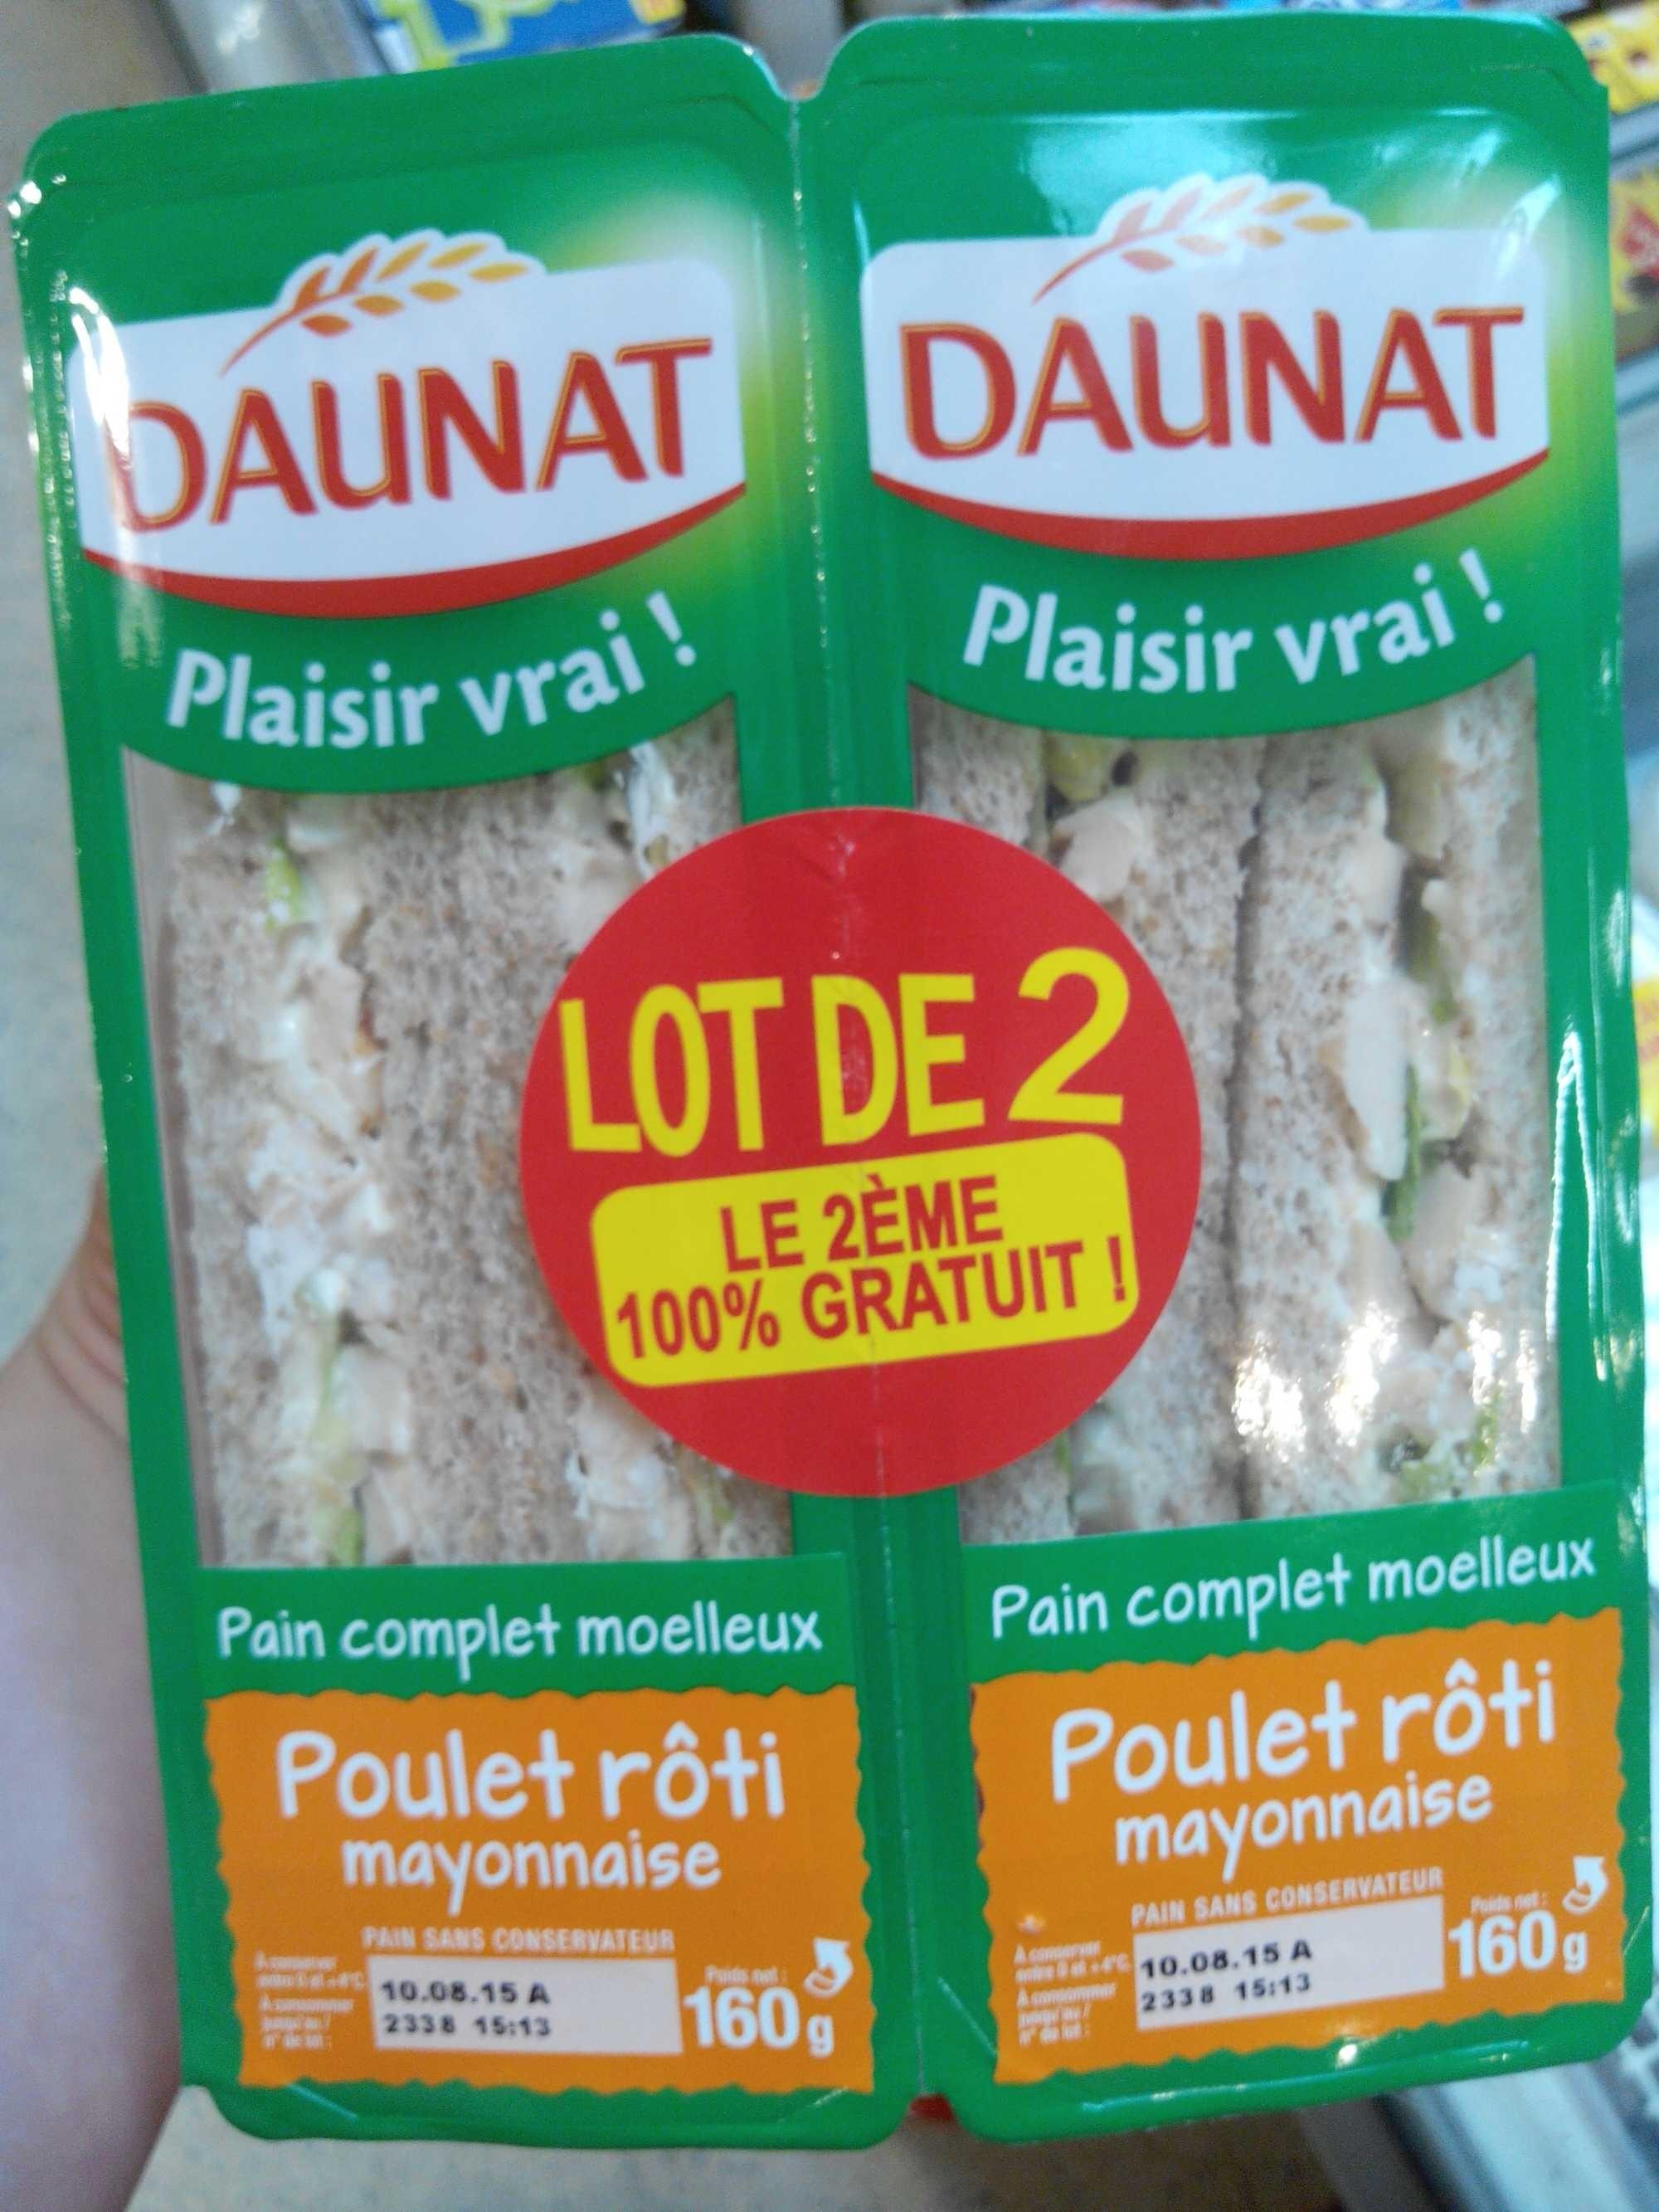 Plaisir vrai! Poulet rôti Mayonnaise - Produit - fr